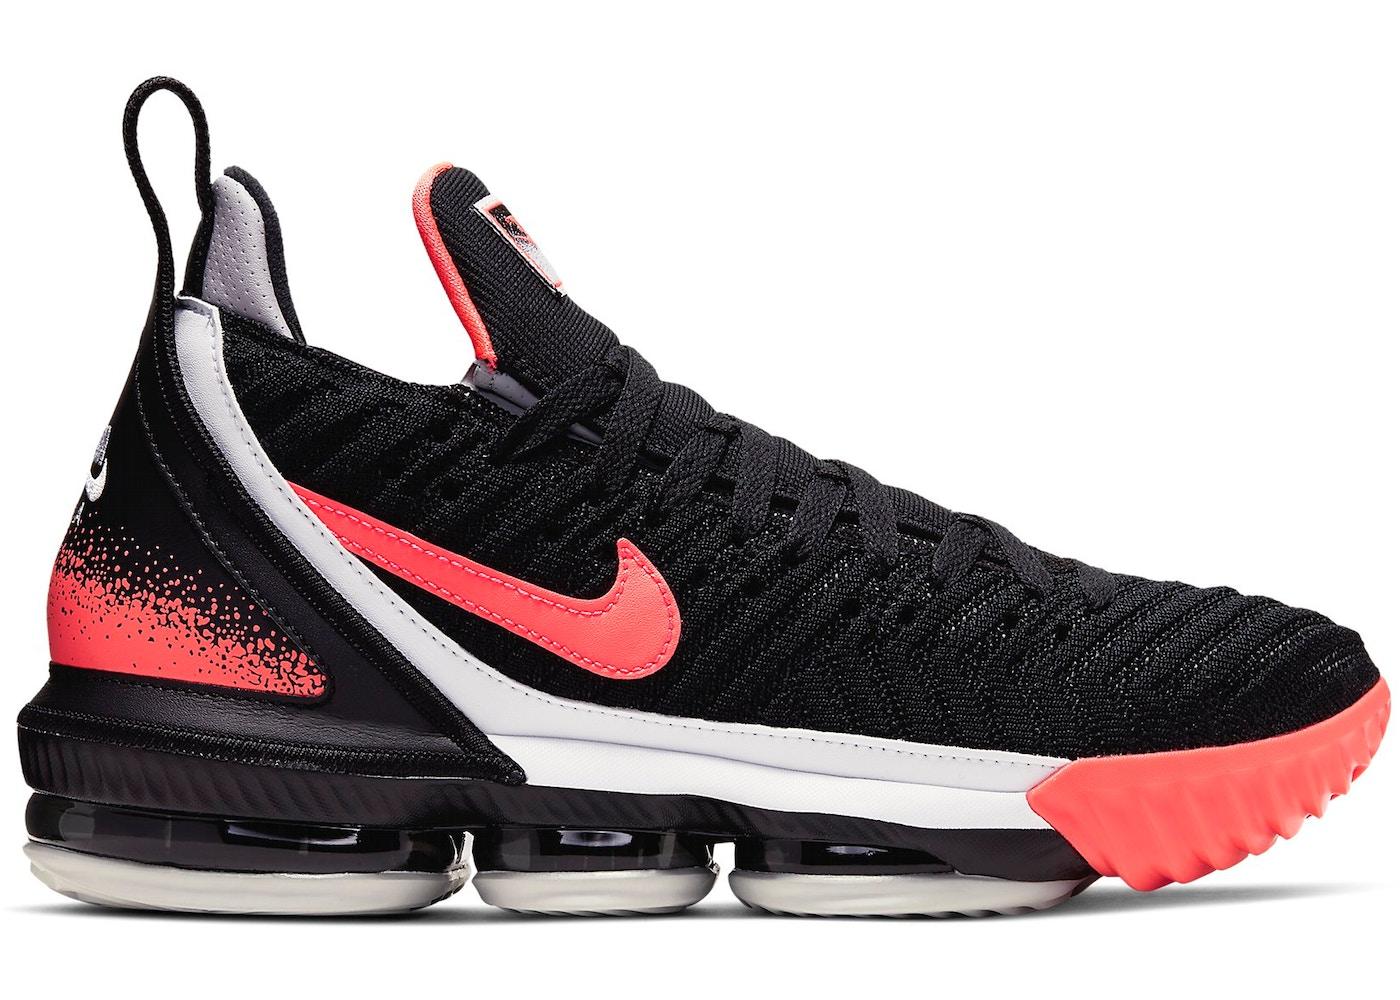 online store 0f8df ef36e Buy Nike LeBron Shoes   Deadstock Sneakers